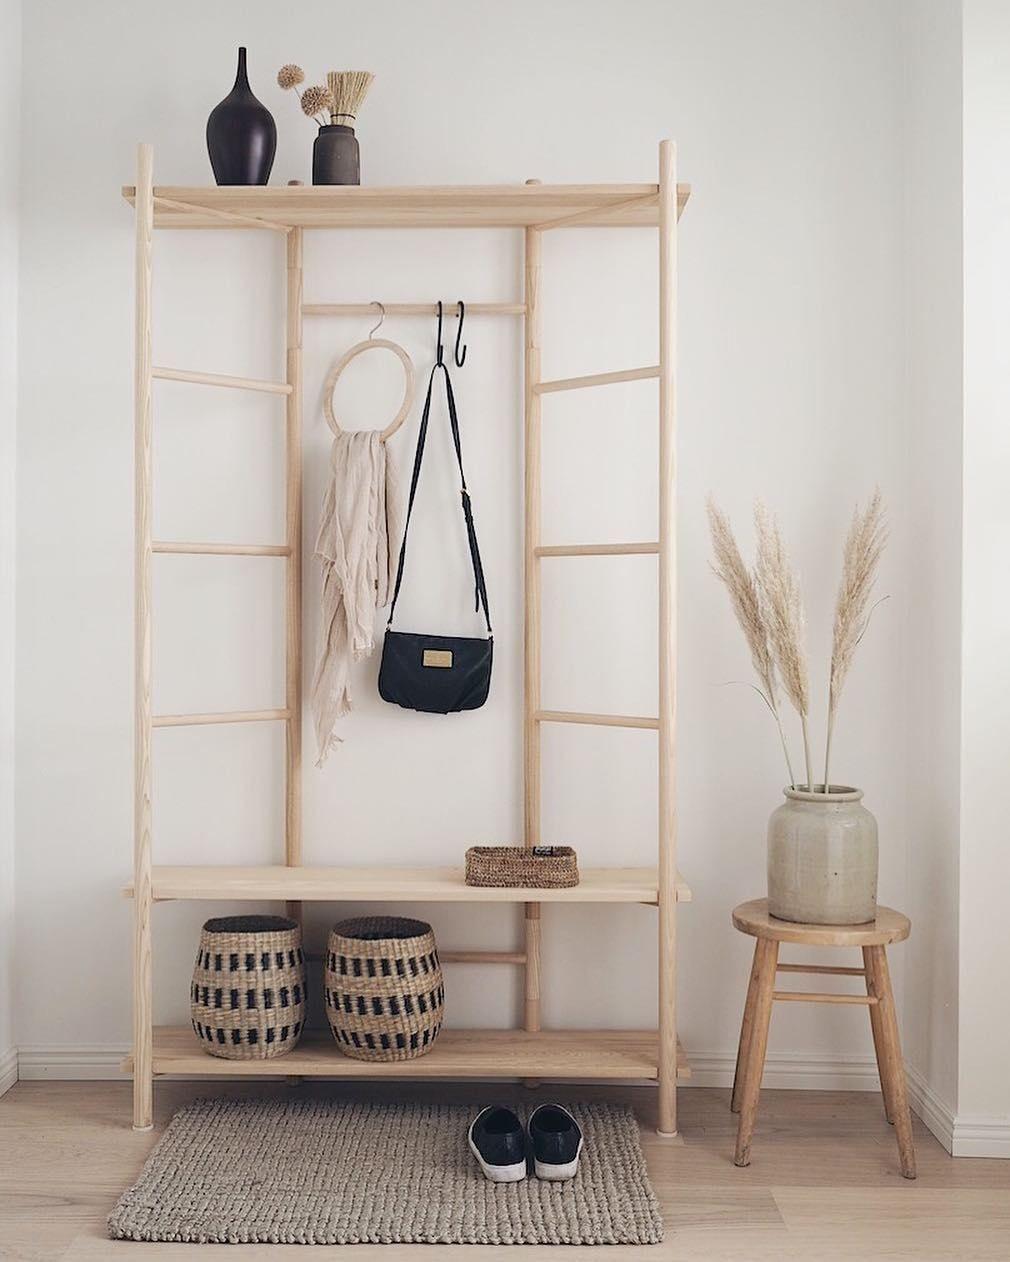 The Elegant Edit Wooden Shelf Design by Samuli Helavuo for Finnish Design House Hakola